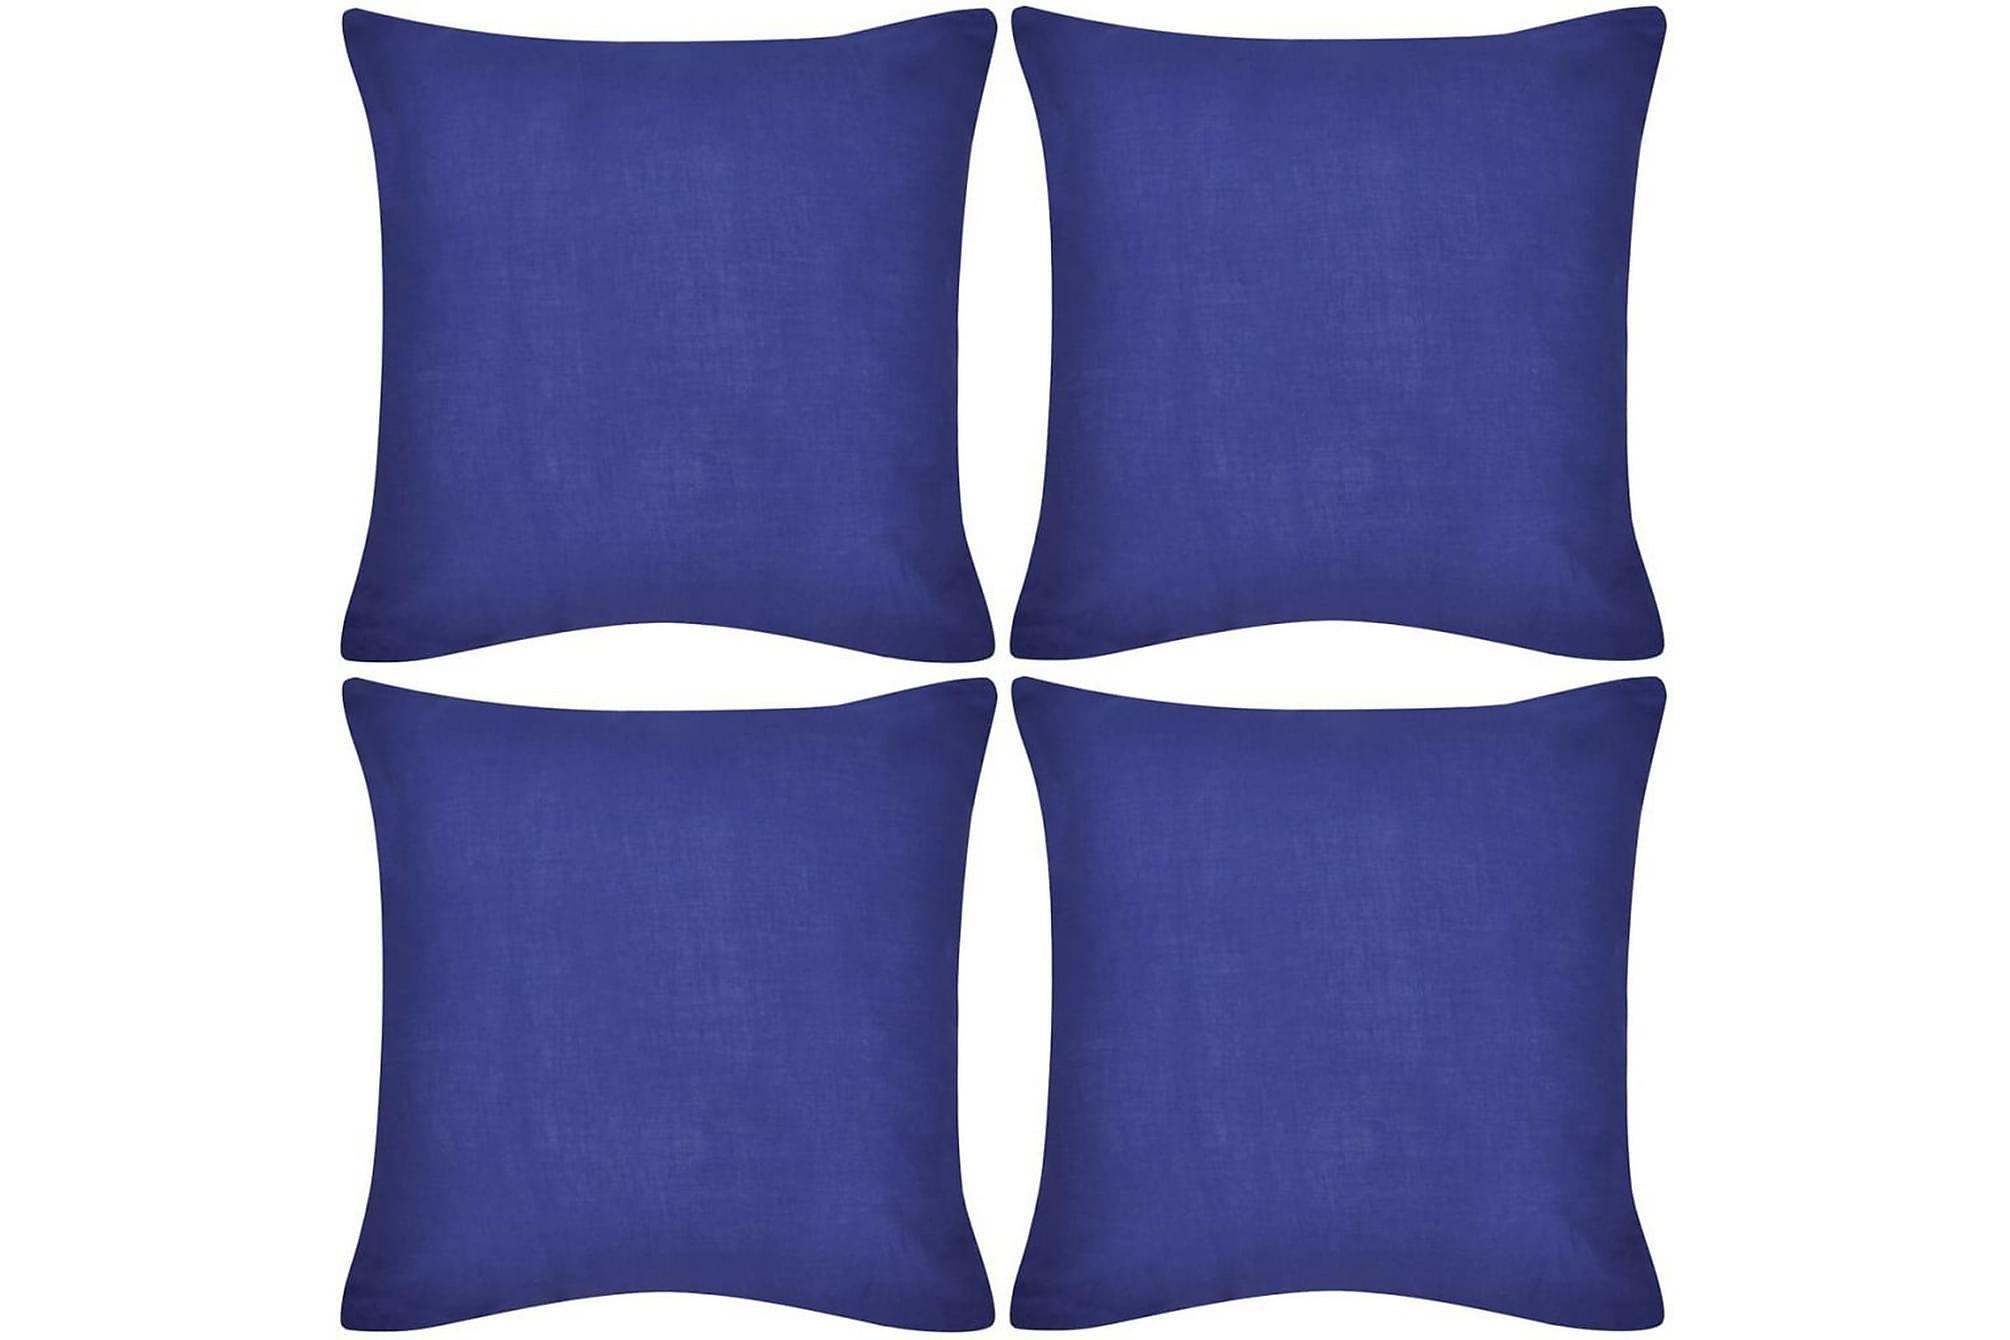 4 Kuddöverdrag i bomull blåa 80 x 80 cm, Prydnadskuddar & filtar